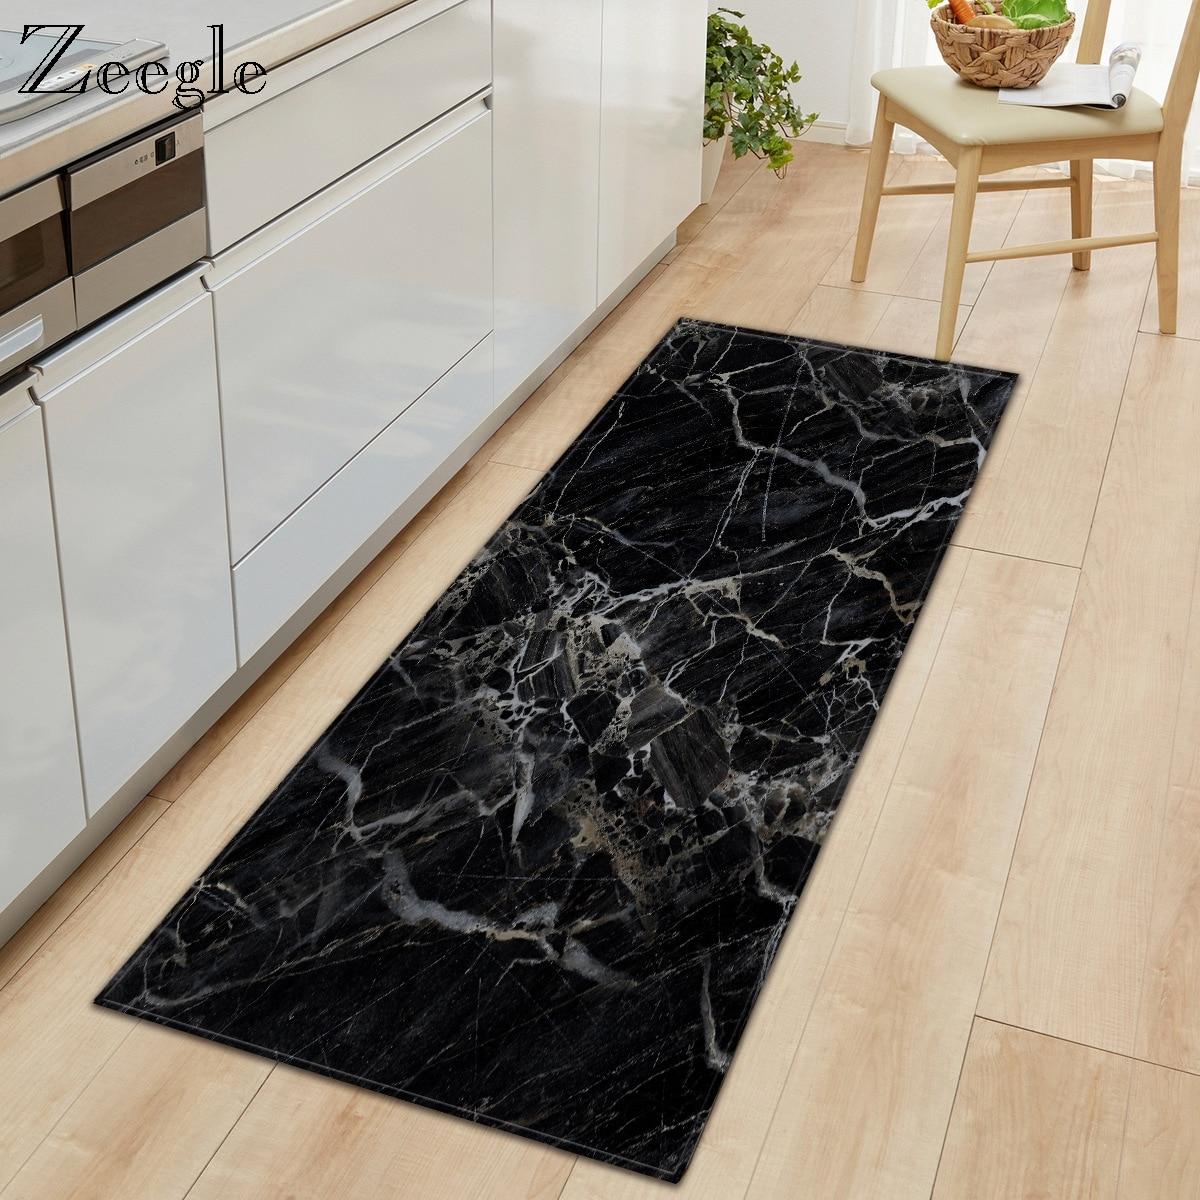 Zeegle Long Floor Mat Carpet For Living Room Marble Printed Entrance Doormat Kitchen Bathroom Anti-slip Rug Polyester Carpet